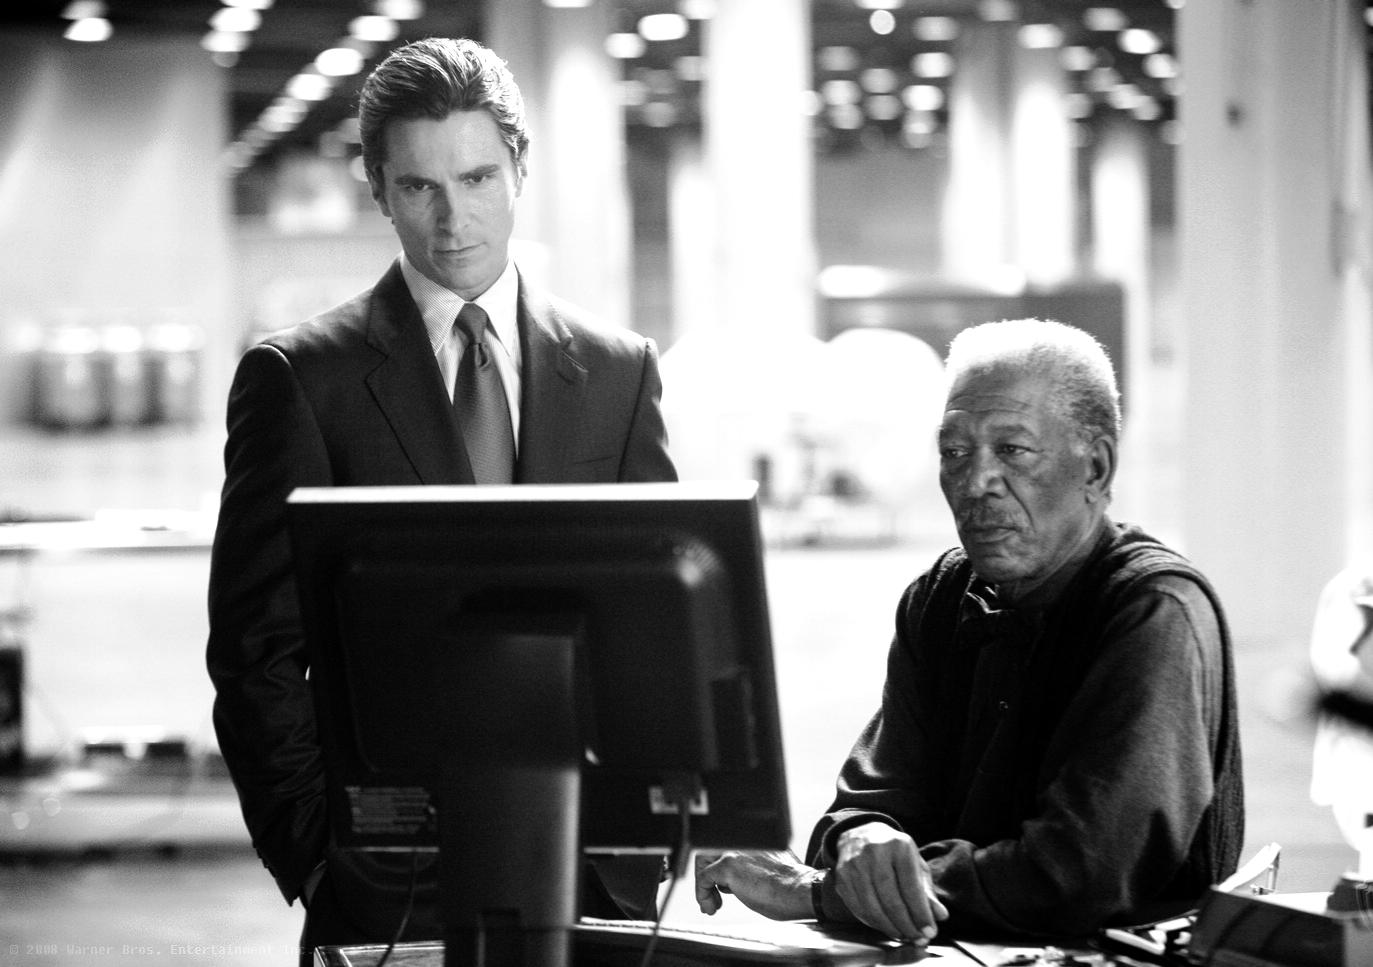 Bruce Wayne & Lucius Fox